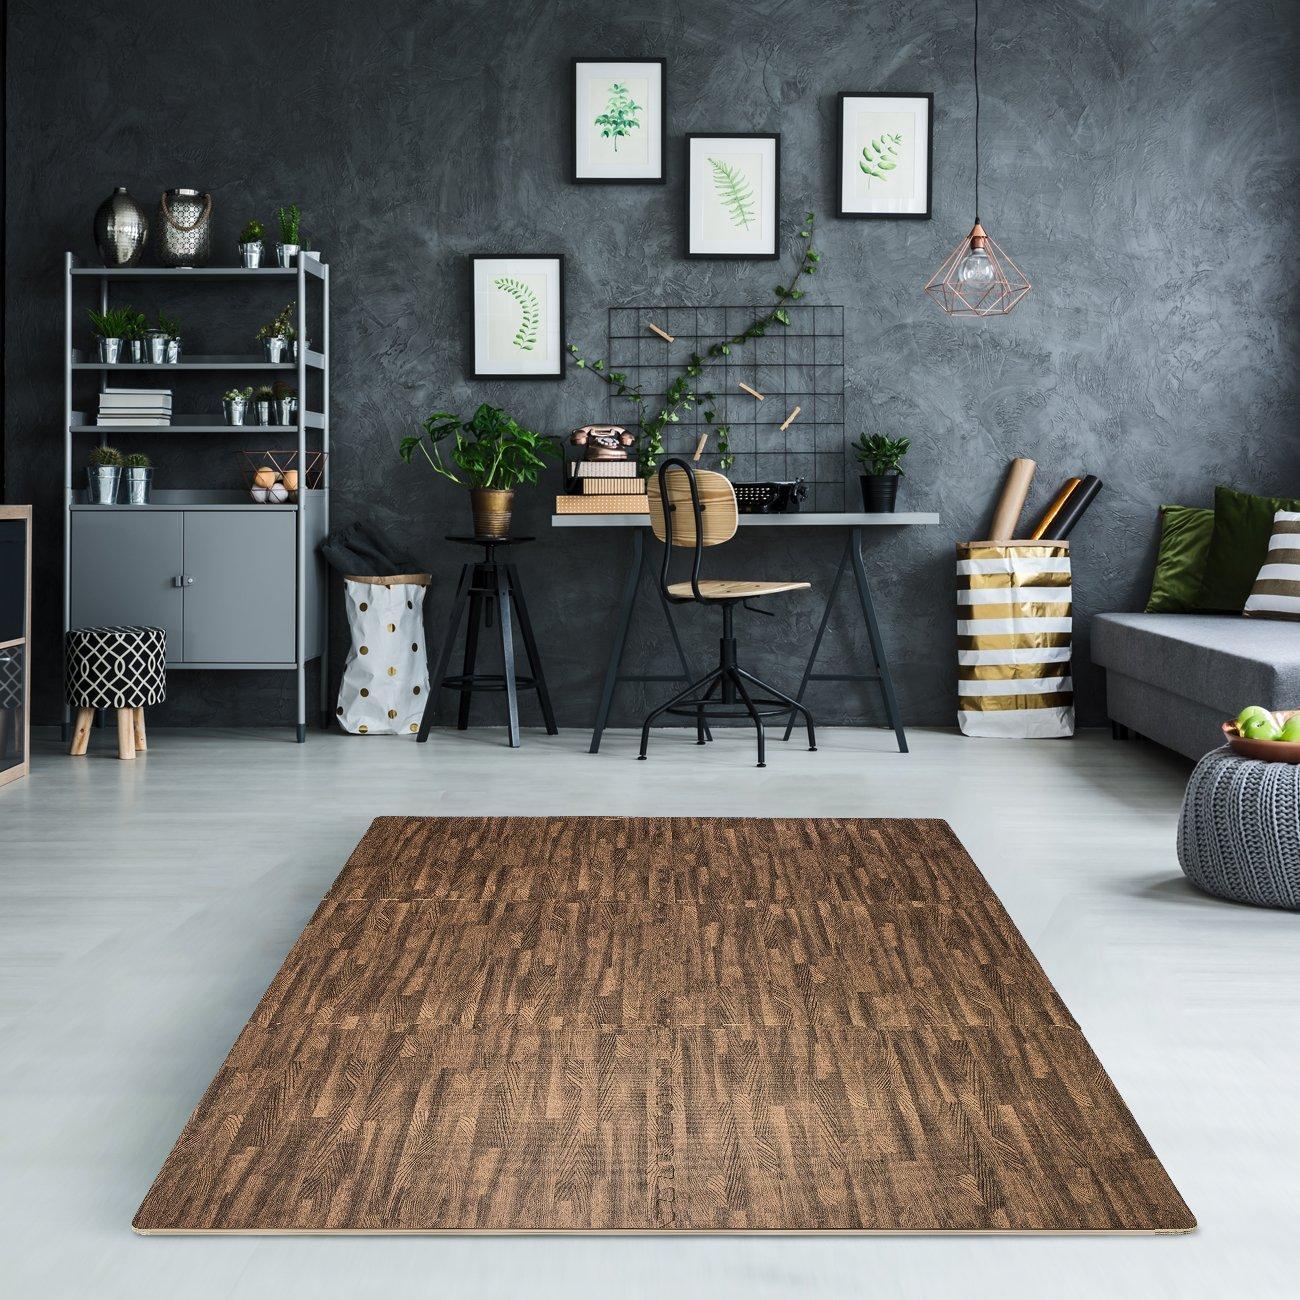 Sorbus Interlocking Floor Mat Print, Wood Grain - Dark (6-Piece) by Sorbus (Image #3)